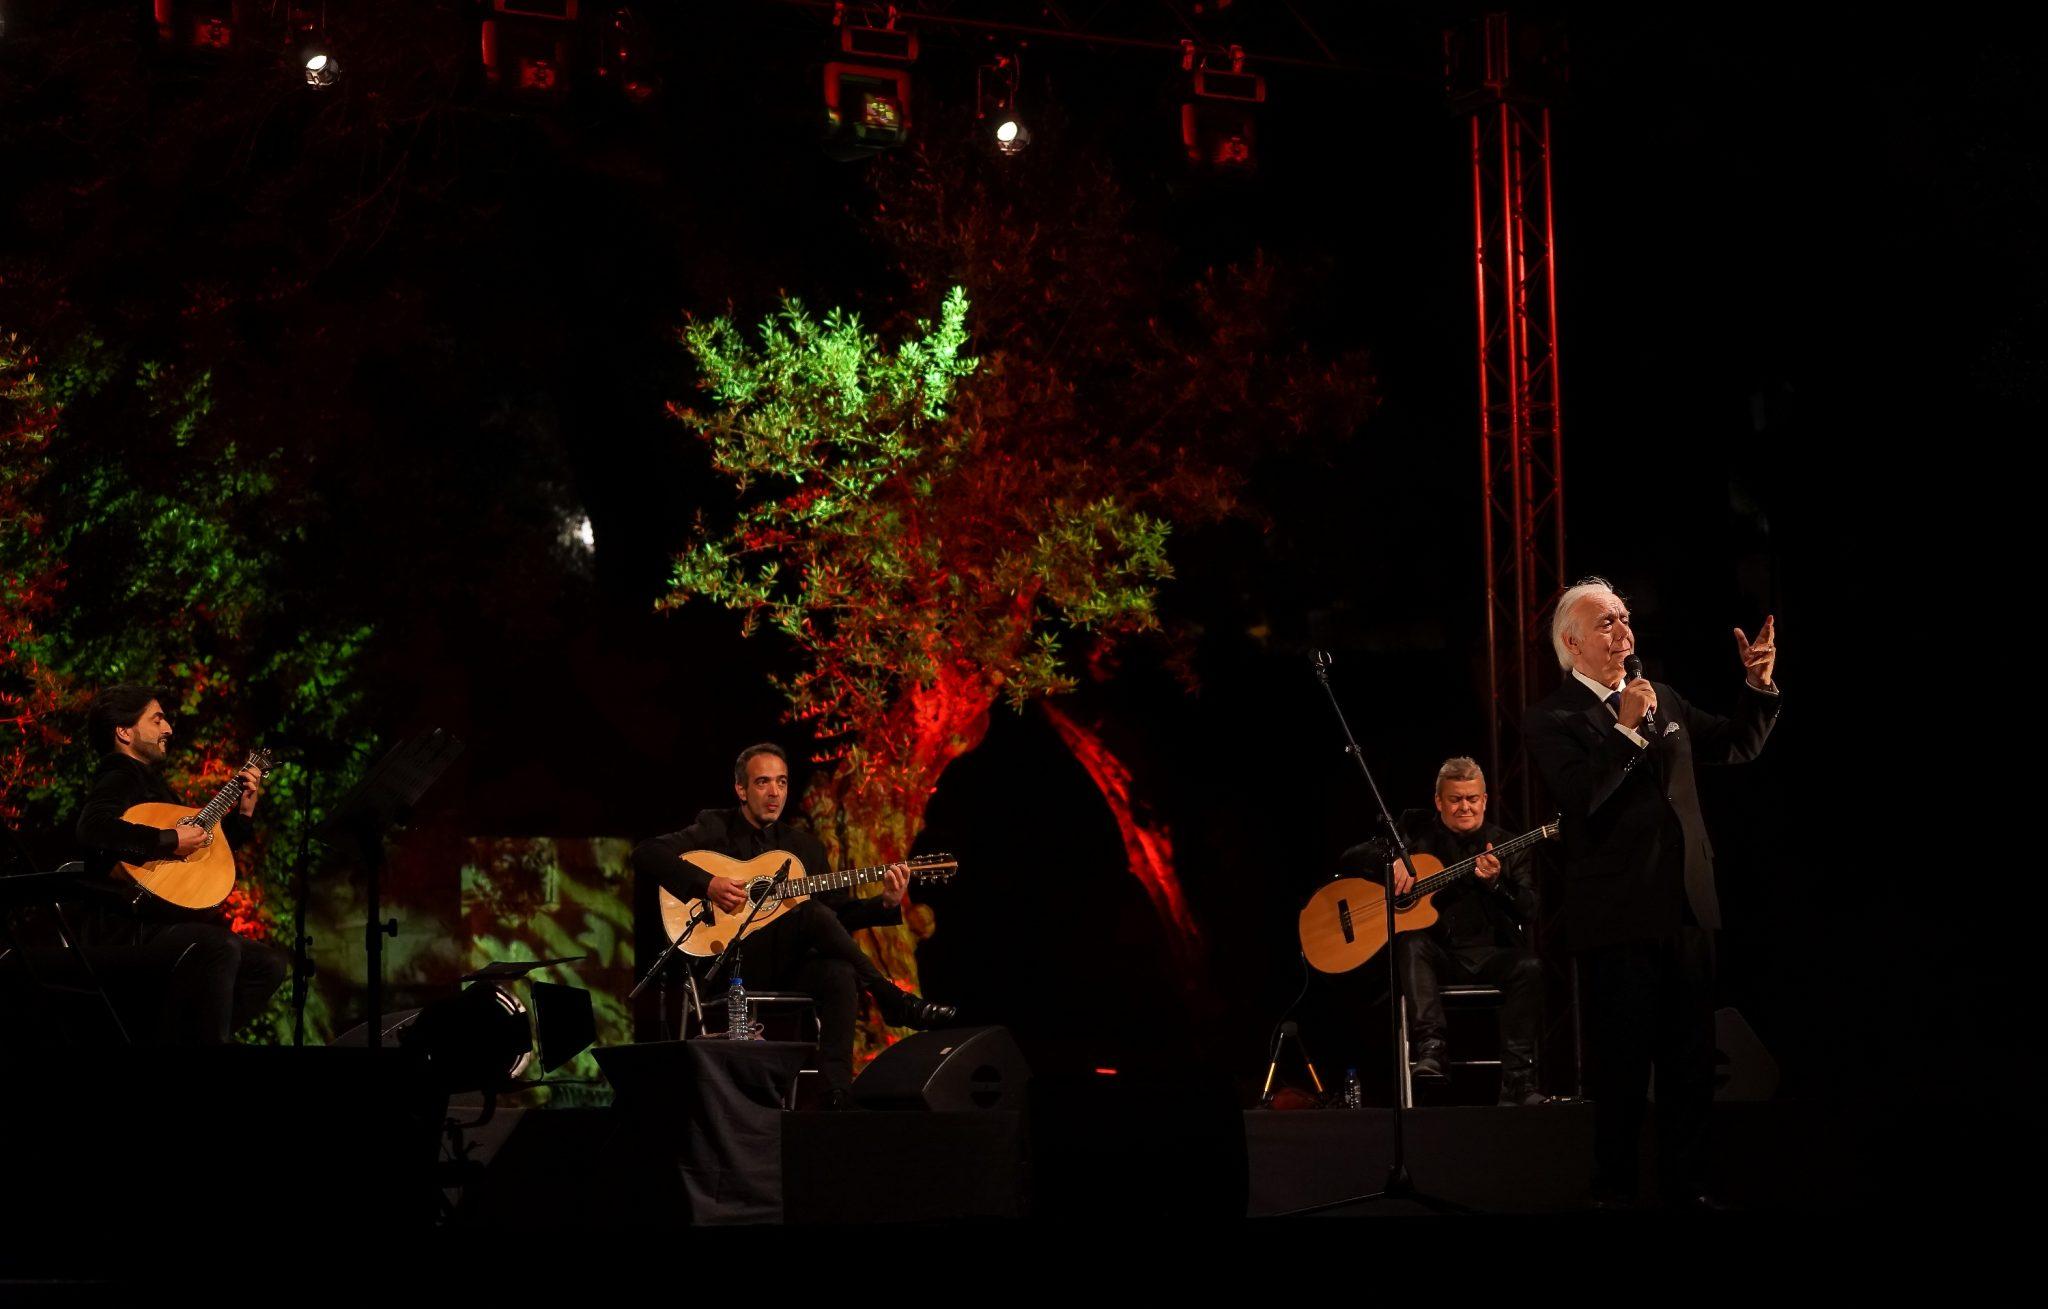 De lado para o observador, Carlos do Carmo canta de microfone na mão. Atrás do fadista, à esquerda do observador, os músicos.